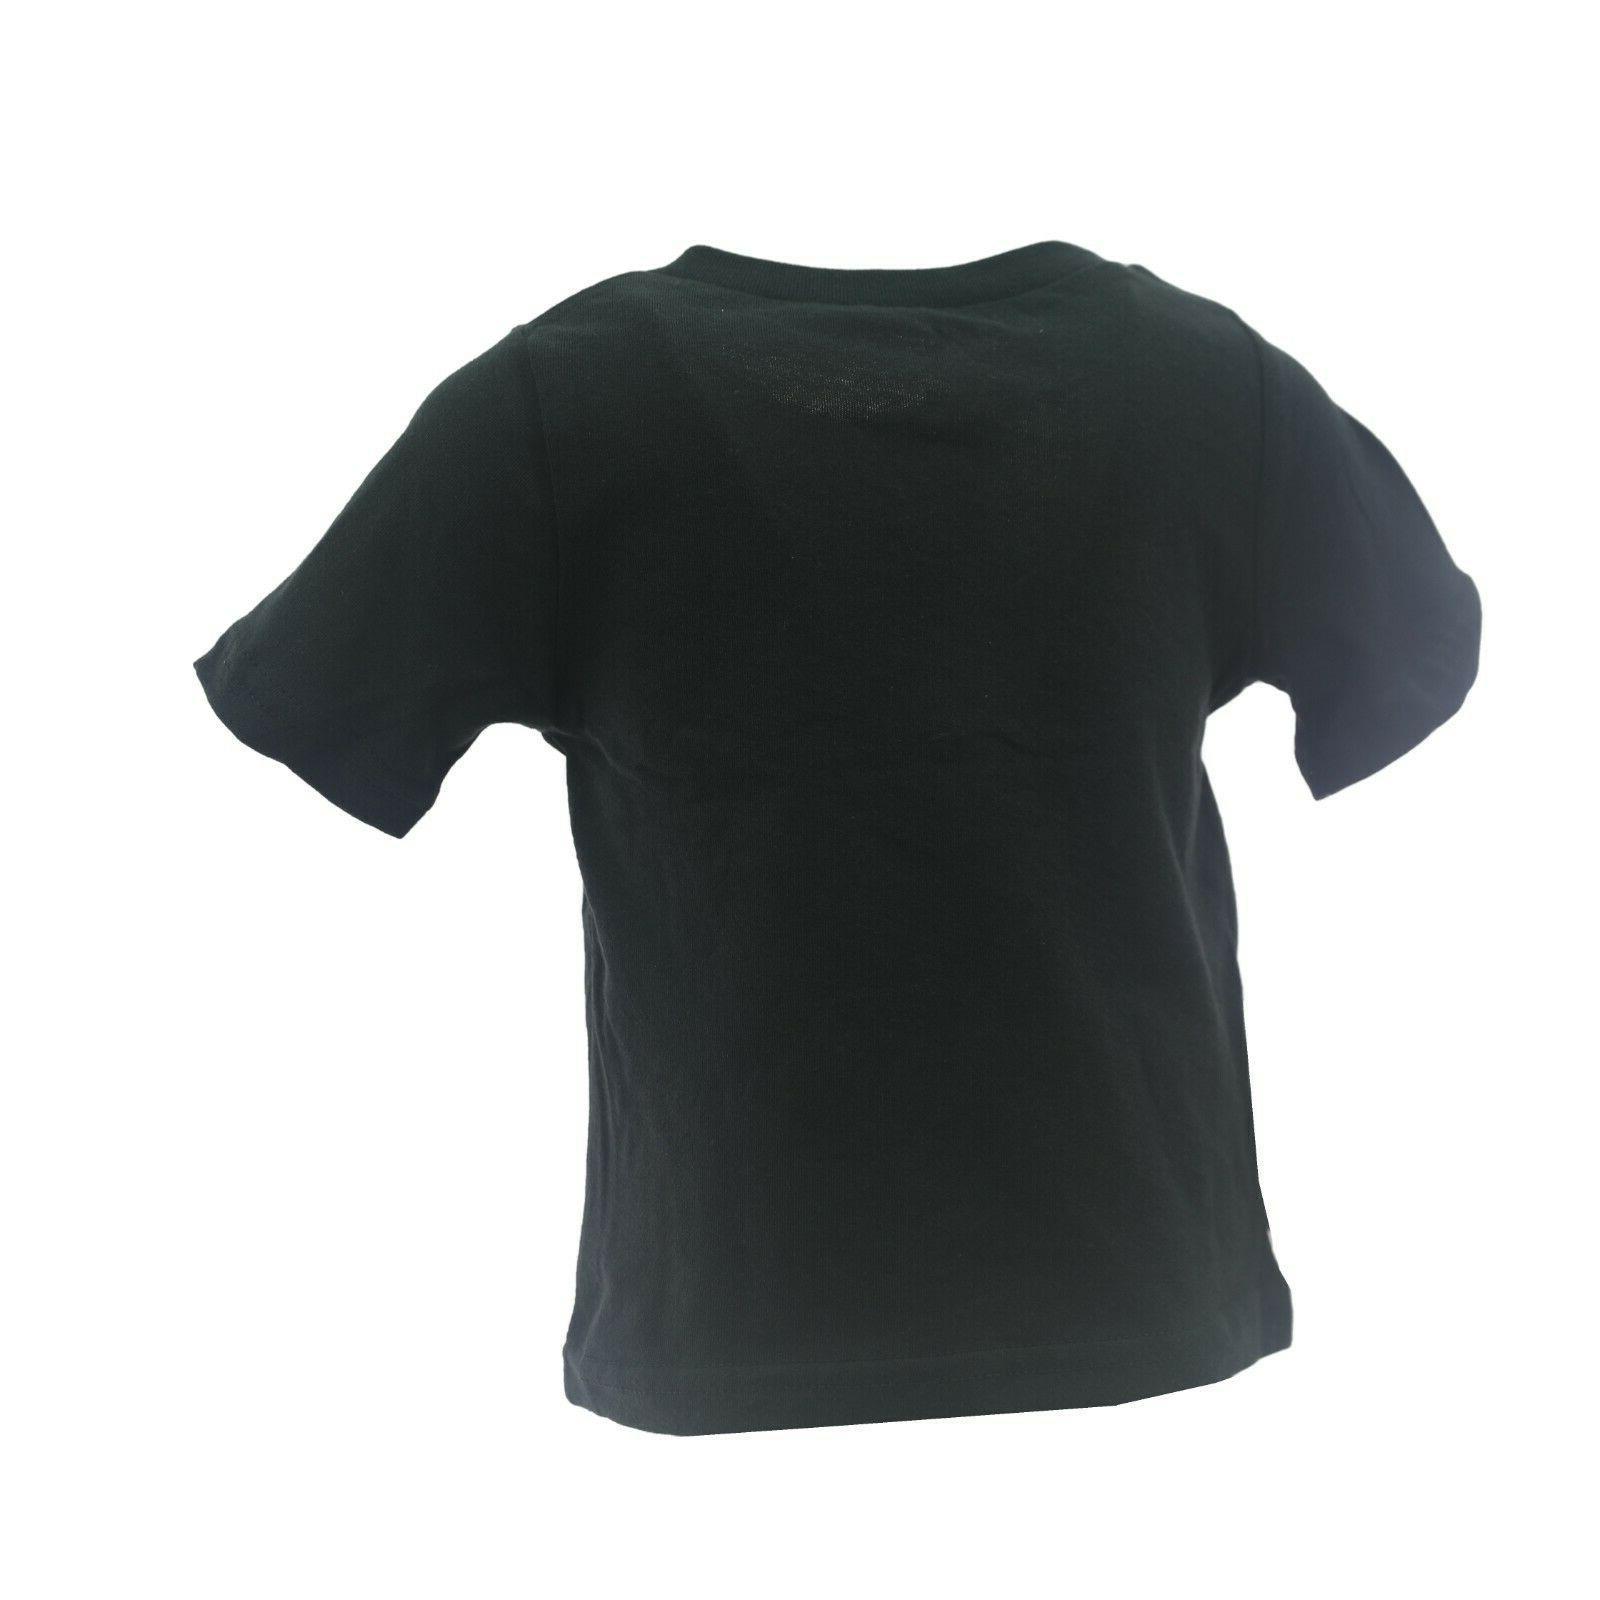 Colorado Rockies Apparel T-Shirt New With